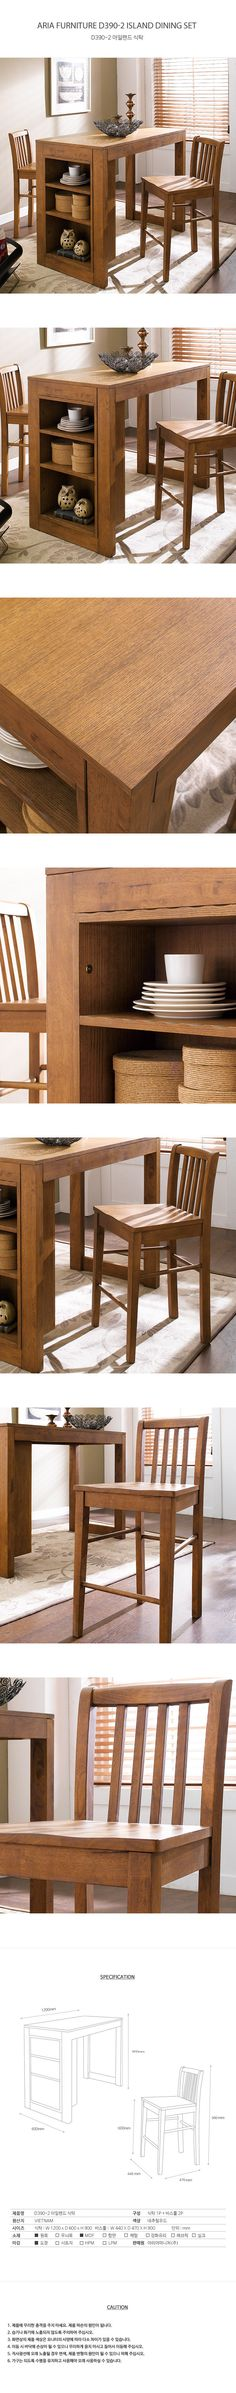 D390-2-Oak Island Dining Set (1 Table + 2 Chairs) > 아일랜드(Table) | 아리아퍼니쳐